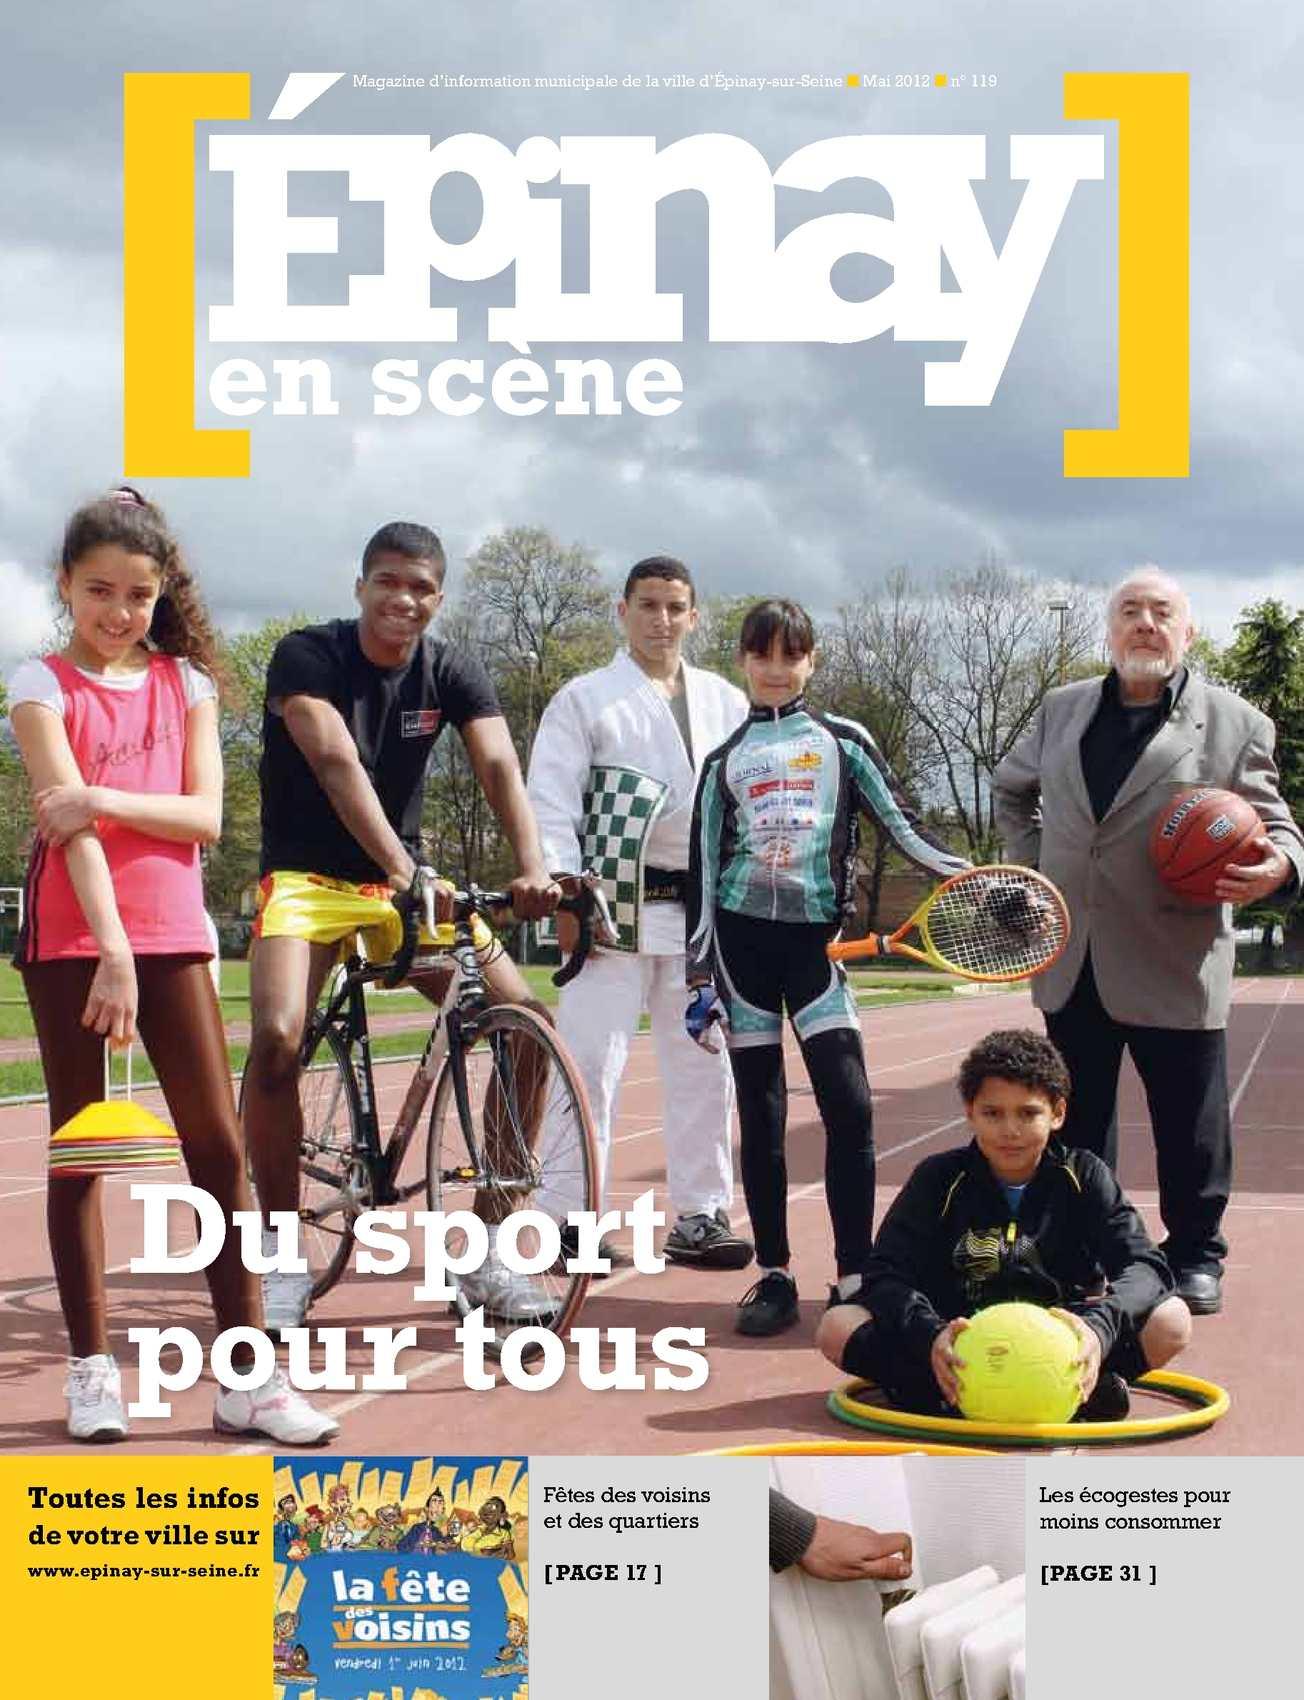 Calaméo - Épinay en scène n°119 Mai 2012